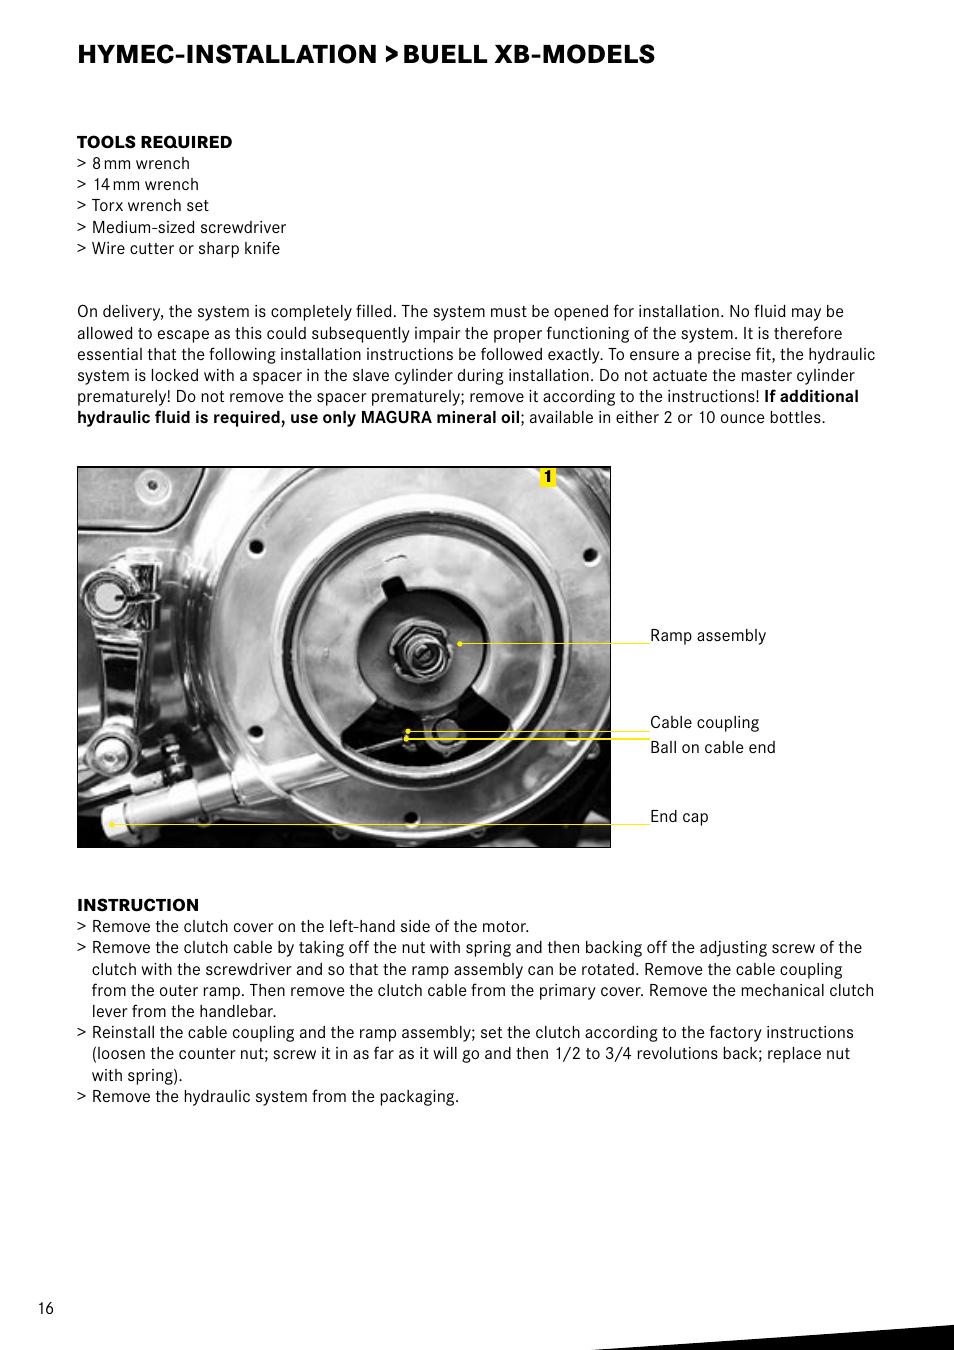 ... Array - daihatsu feroza gearbox manual ebook rh daihatsu feroza gearbox  manual ebook vwhost org